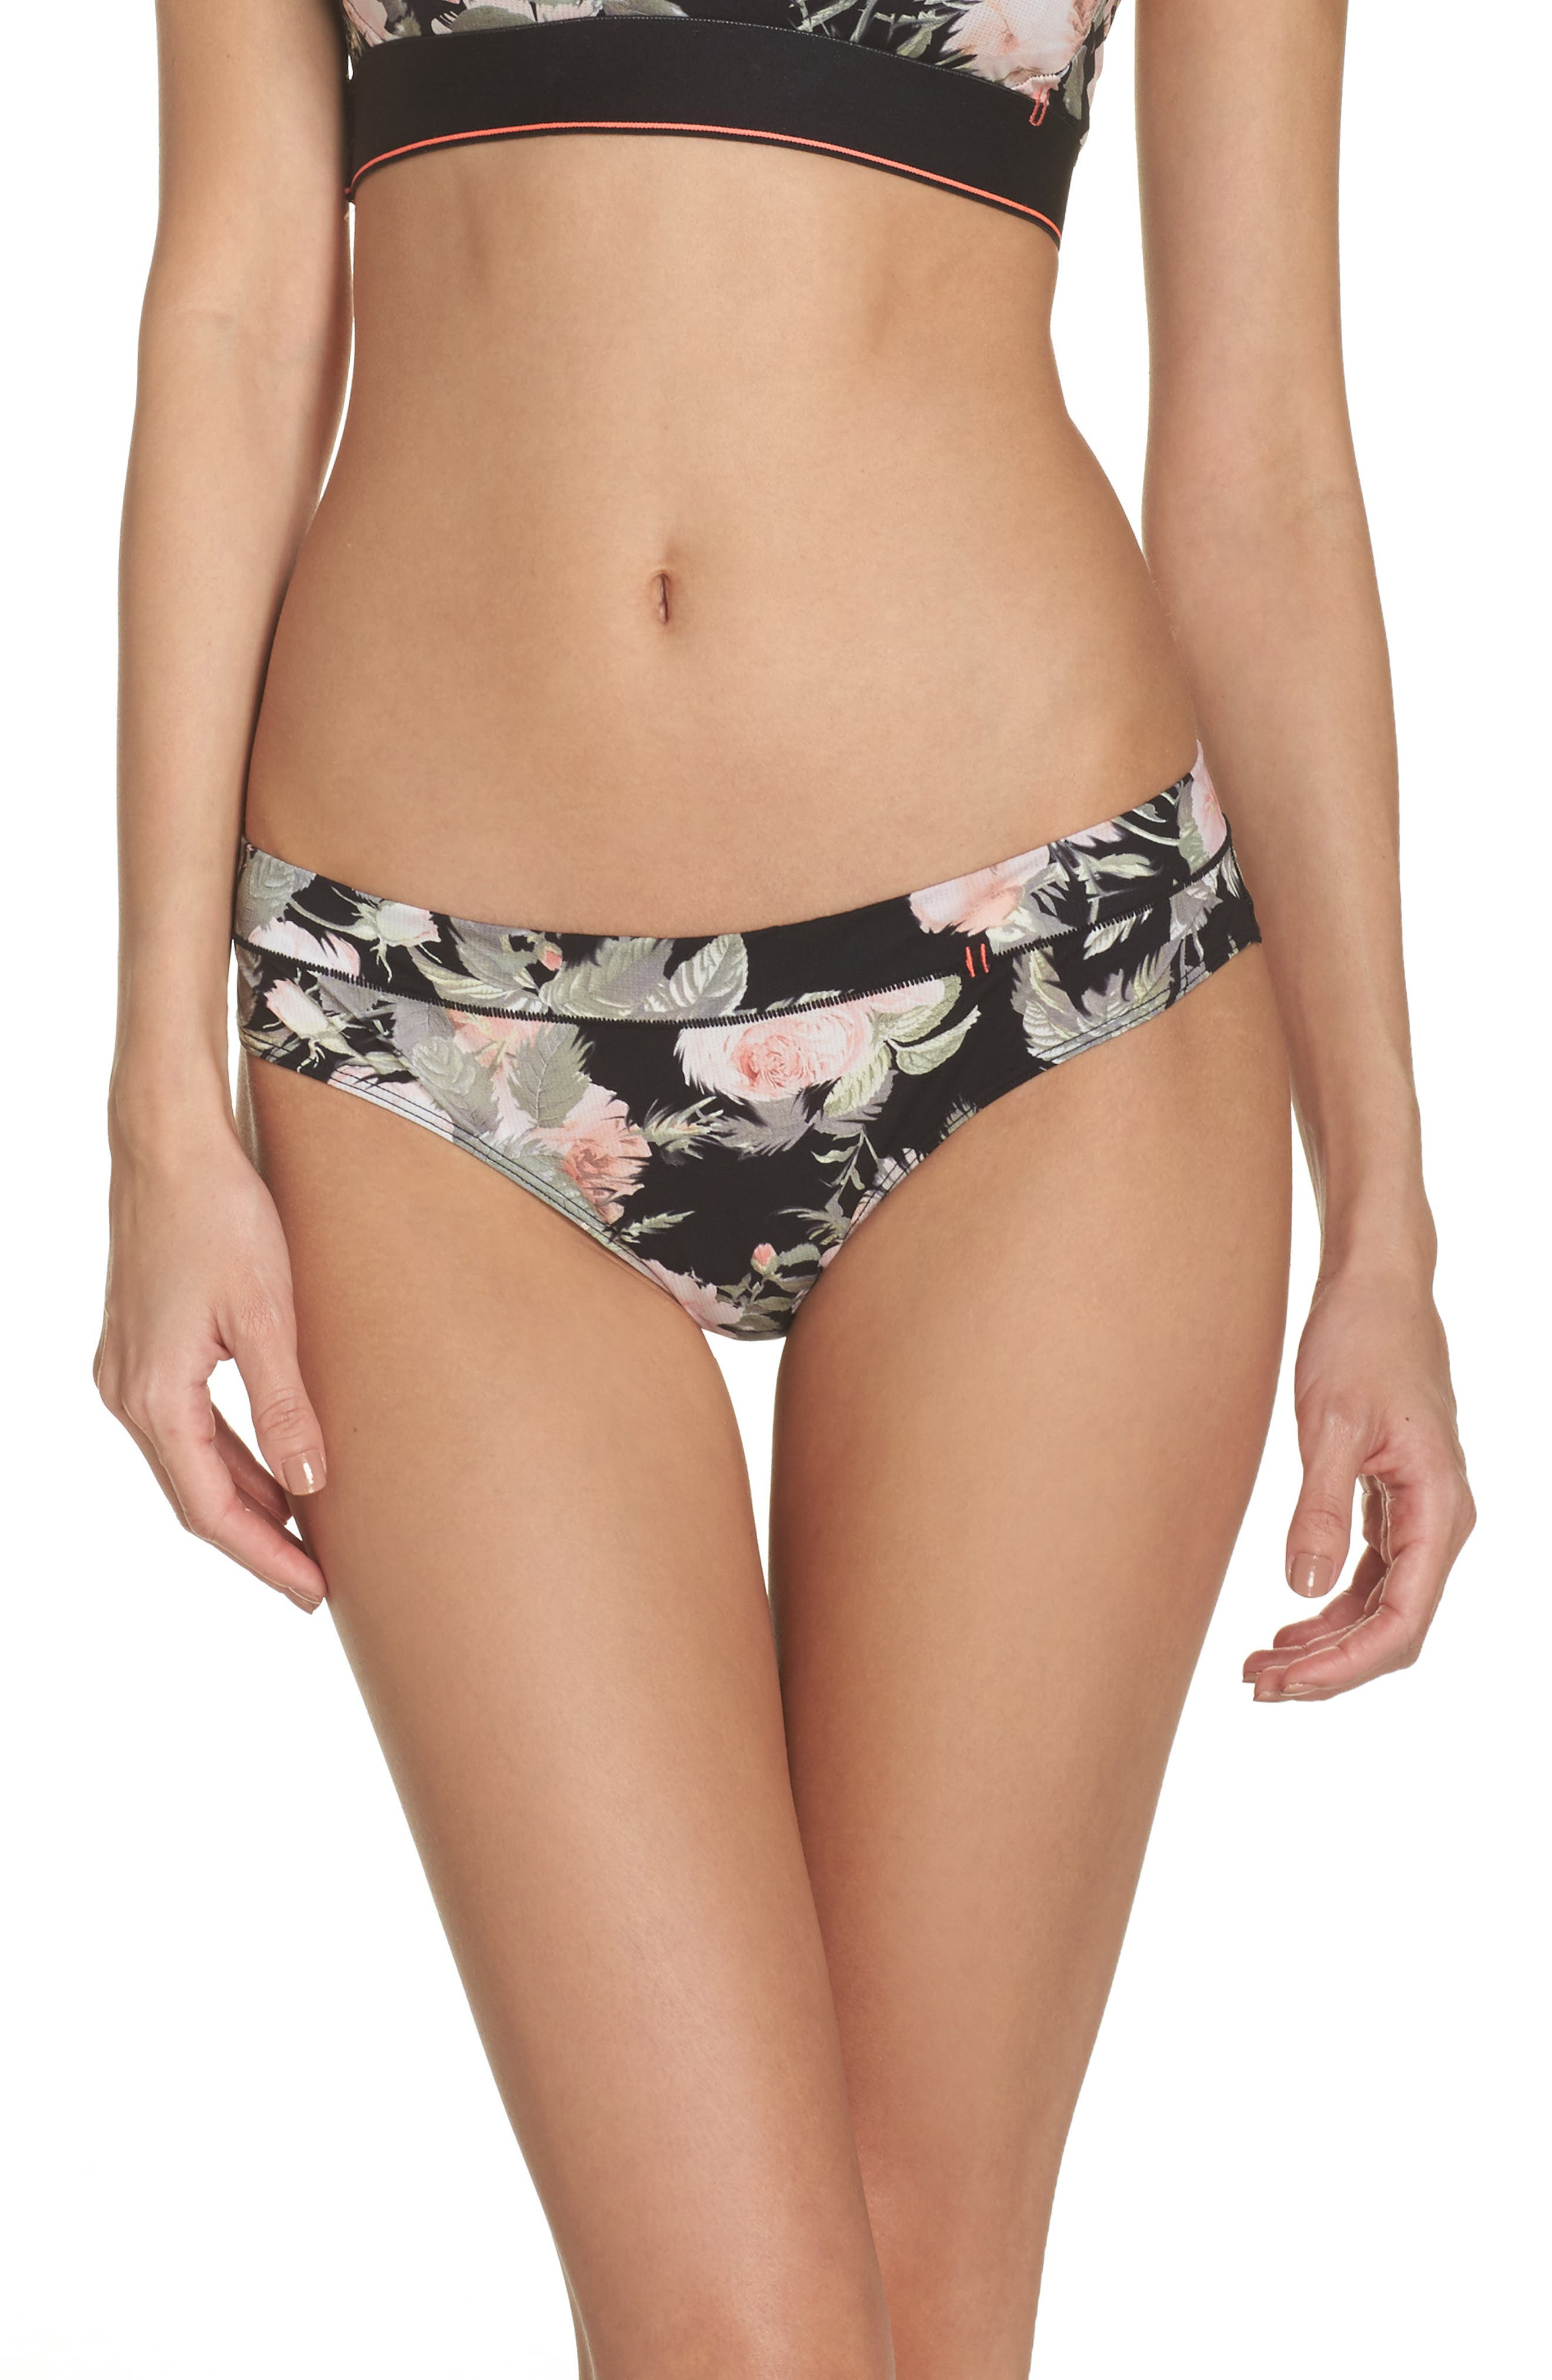 Beau Floral Cheeky Panties,                         Main,                         color, 001